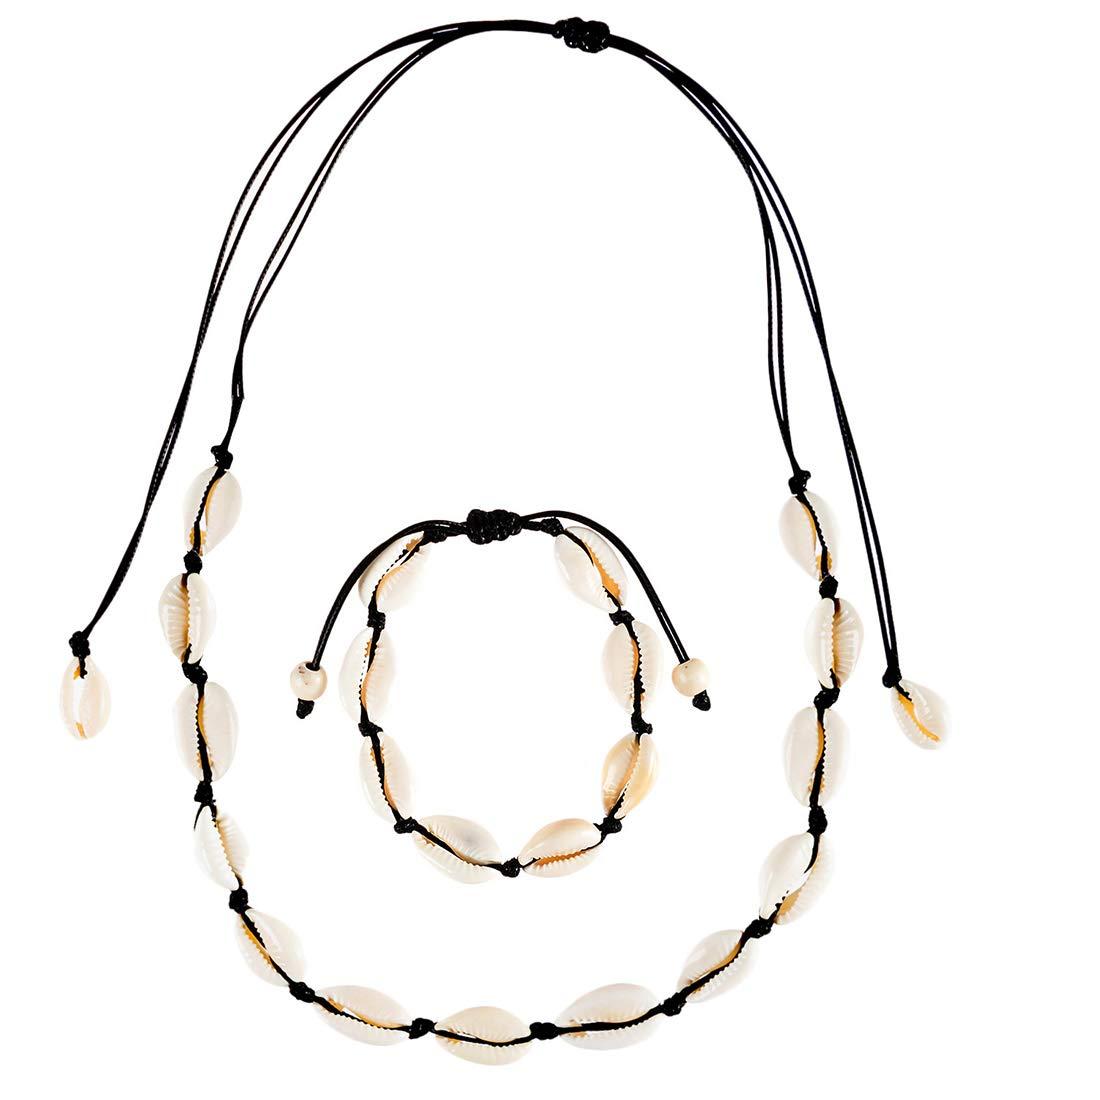 Abitoncc Natural Shell Necklace Bracelets Cord Beach Puka Sea Shell Pearl Choker Handmade Adjustable for Girls Women Jewelry